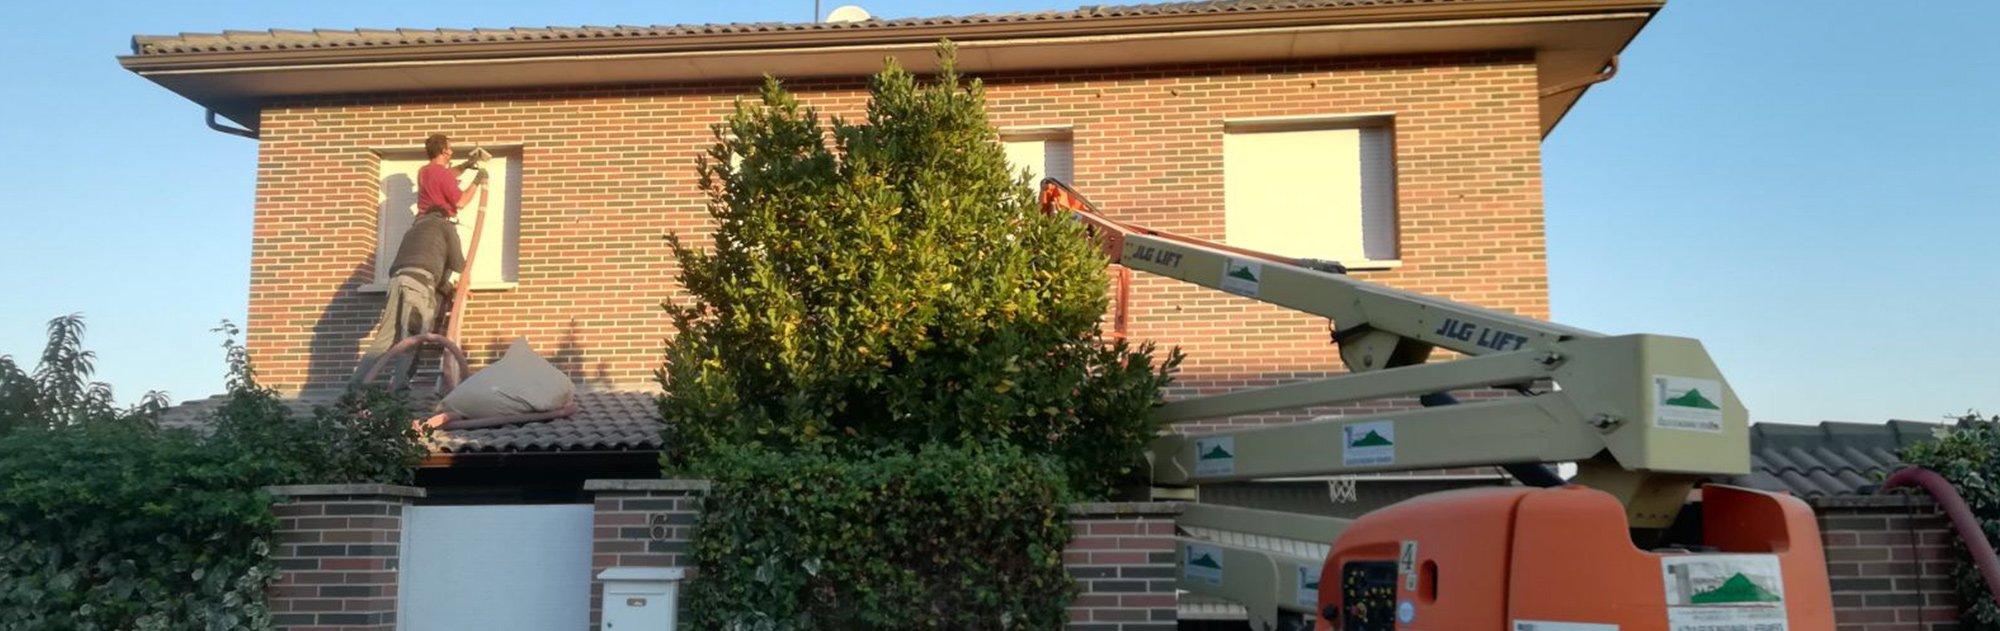 Aislamiento en fachadas sin obra